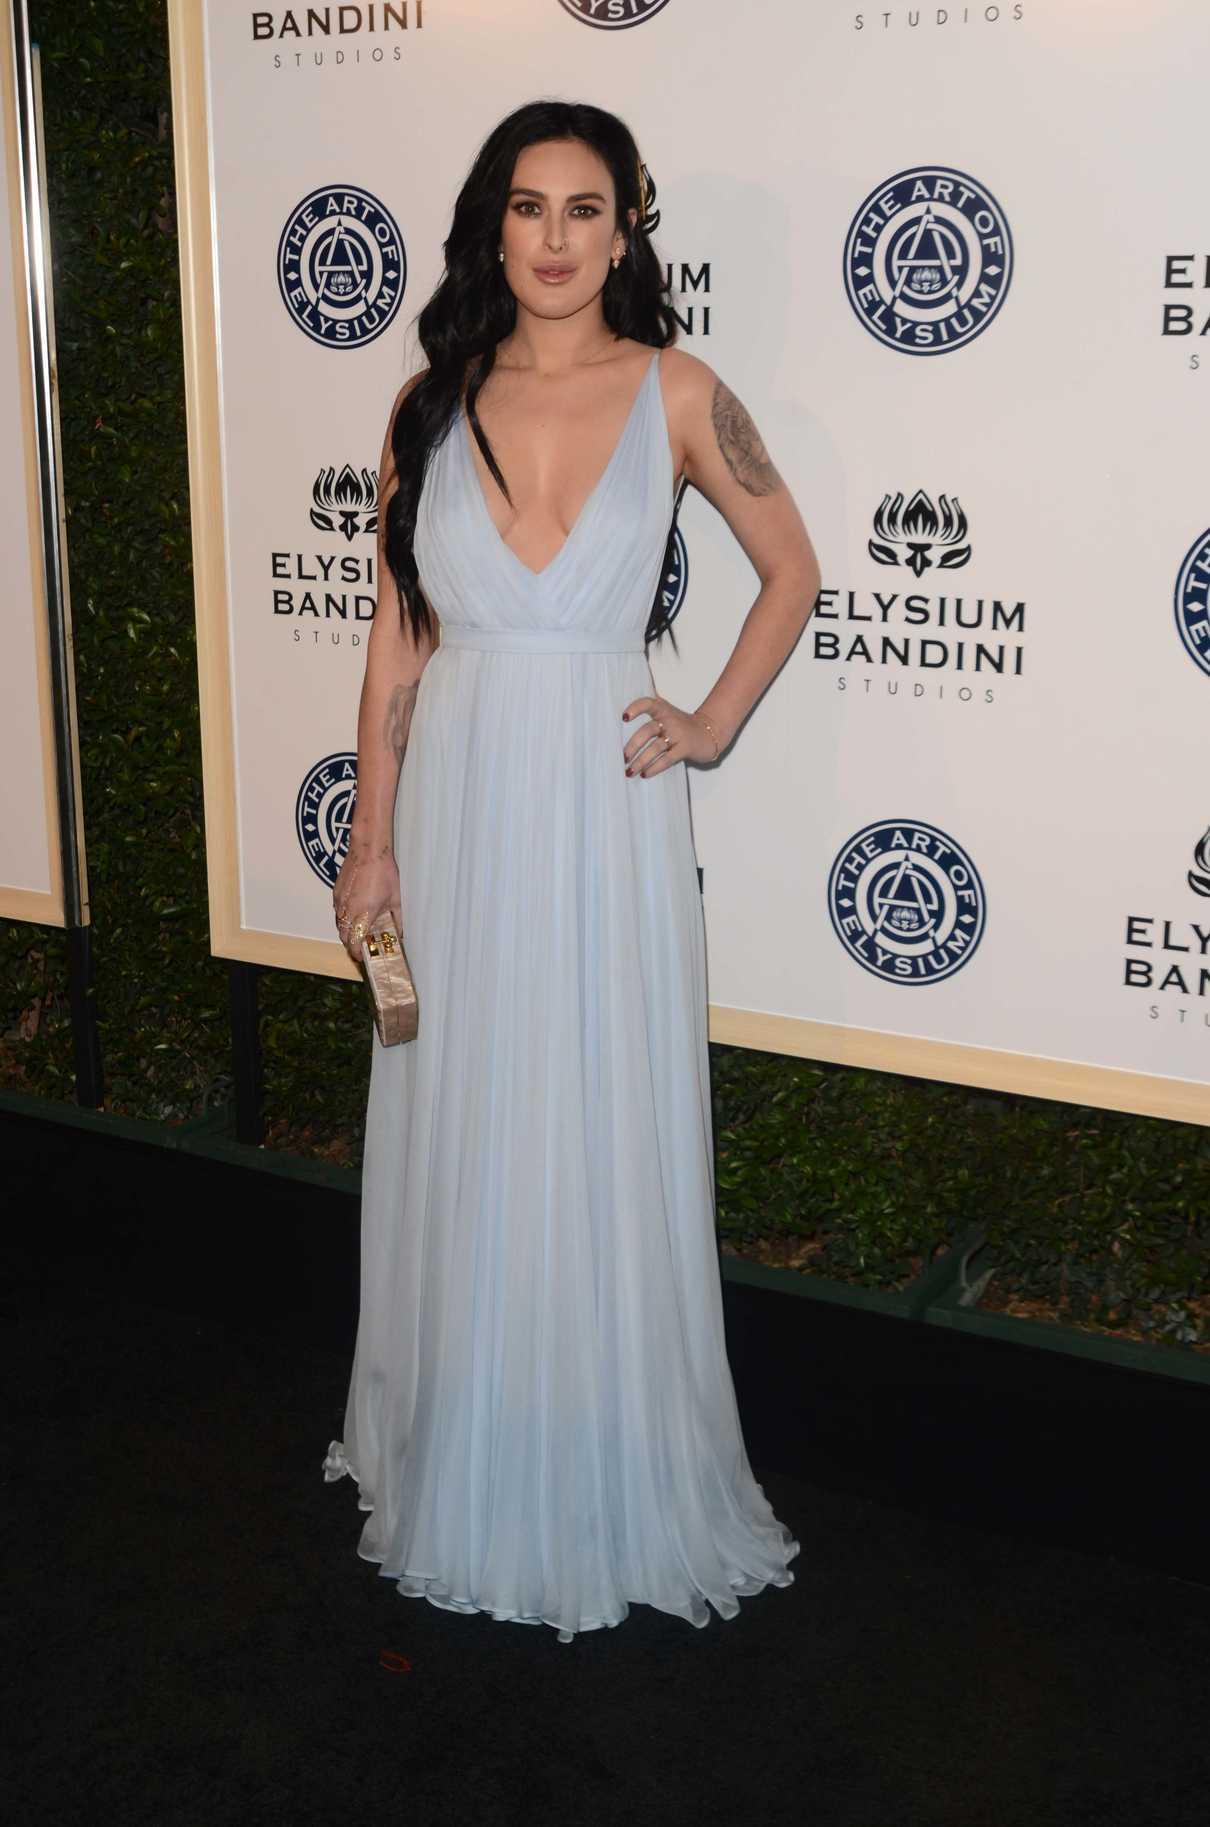 Rumer Willis at the 10rh Annual Art of Elysium Heaven Gala in Los Angeles 01/07/2017-3